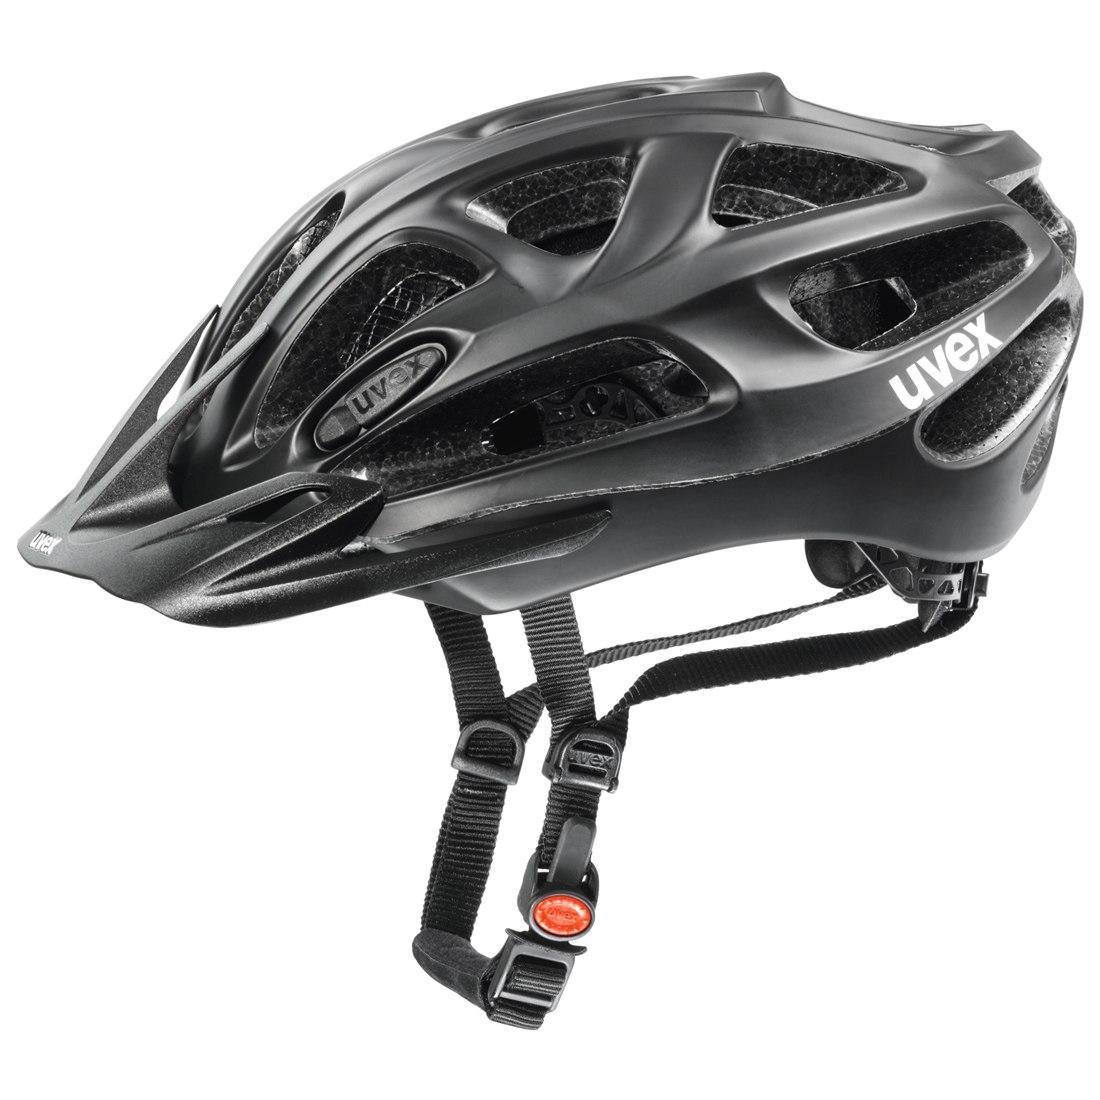 Uvex supersonic cc Helmet - black mat